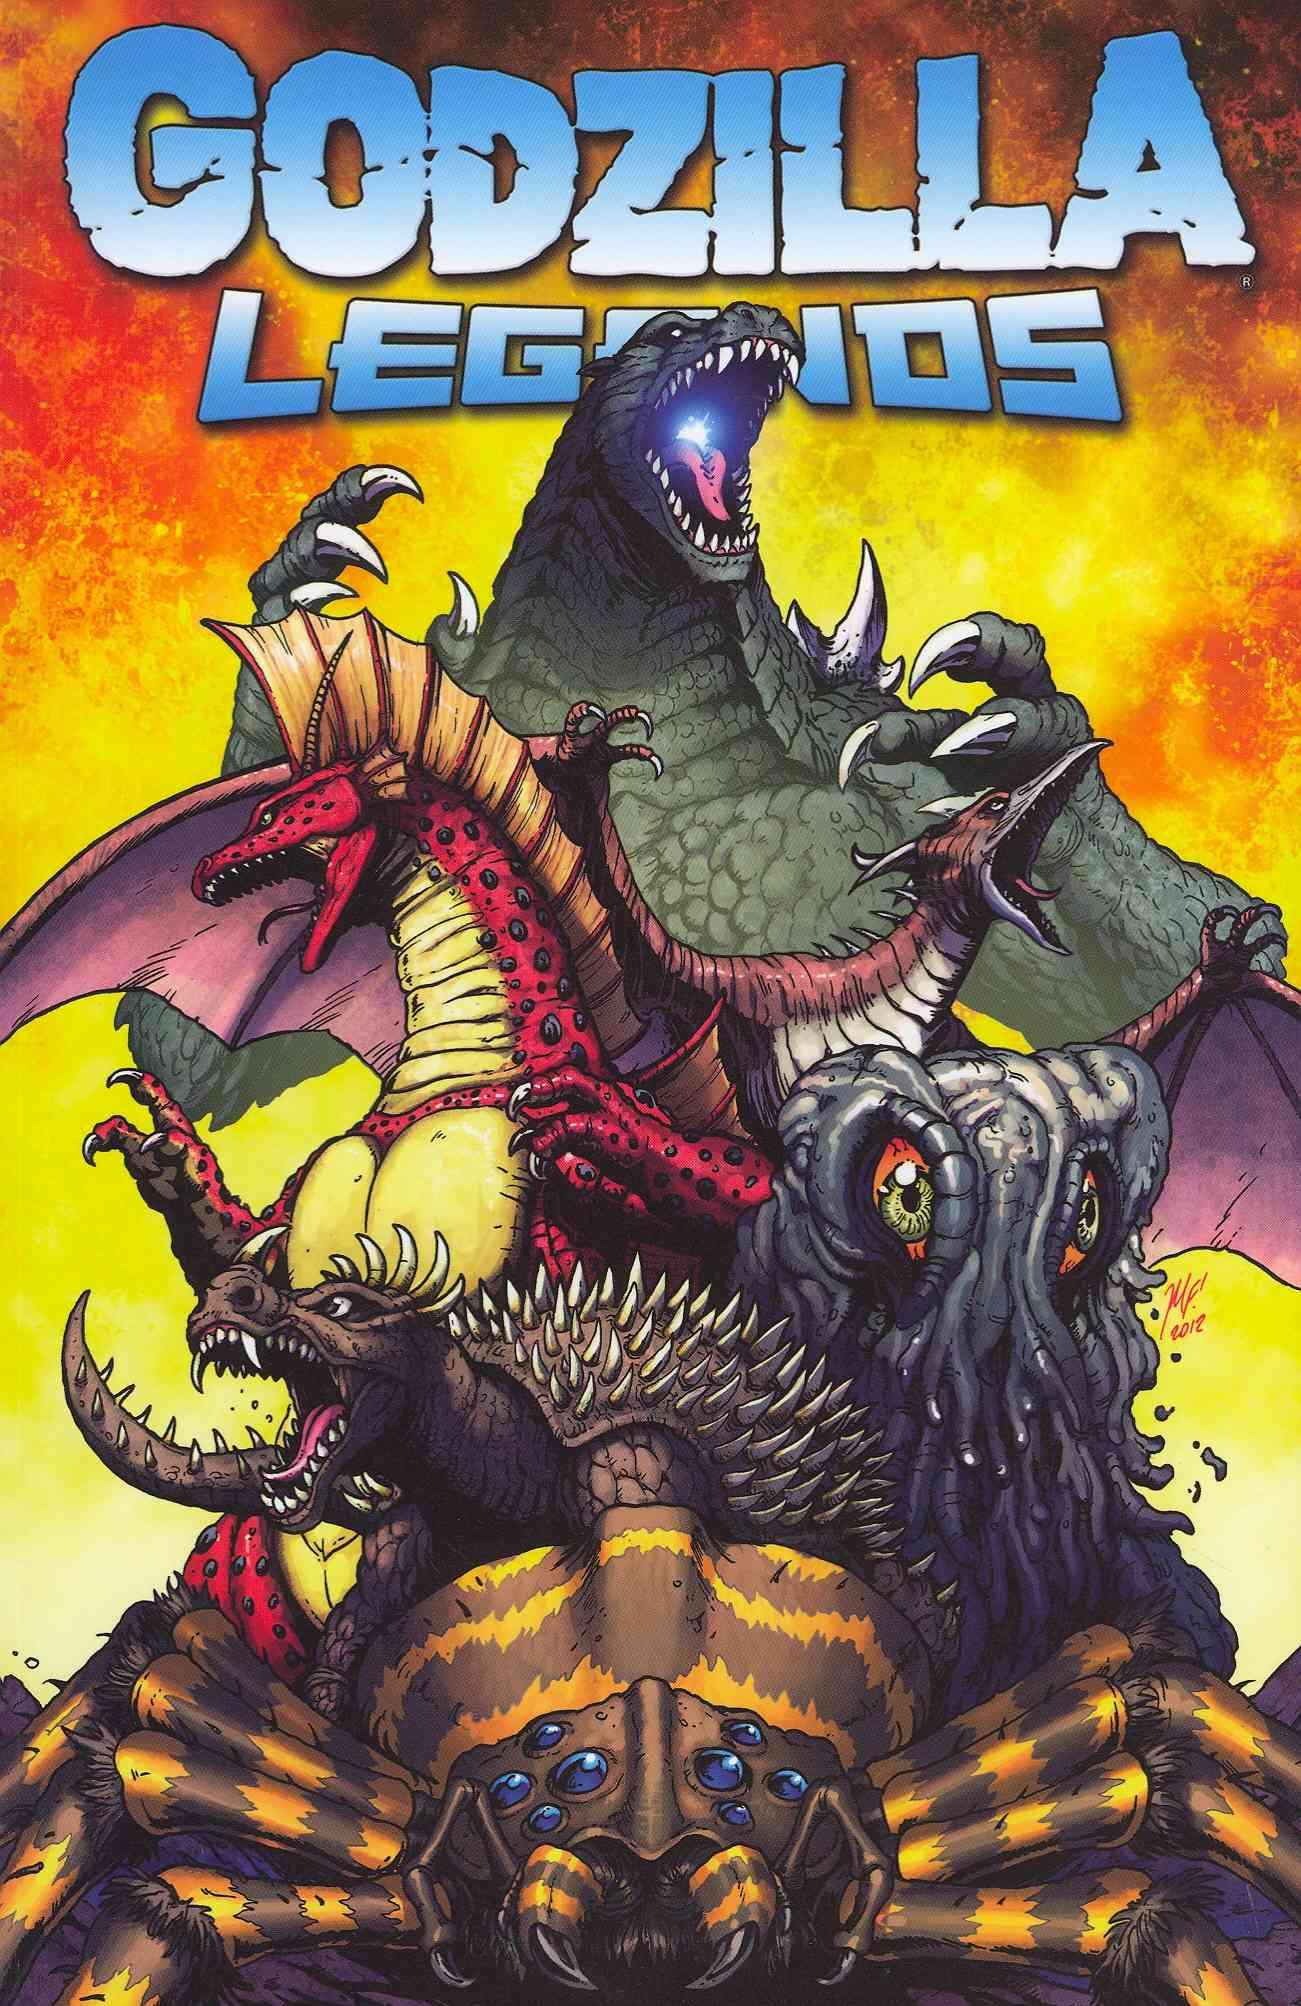 Godzilla Legends (Paperback)